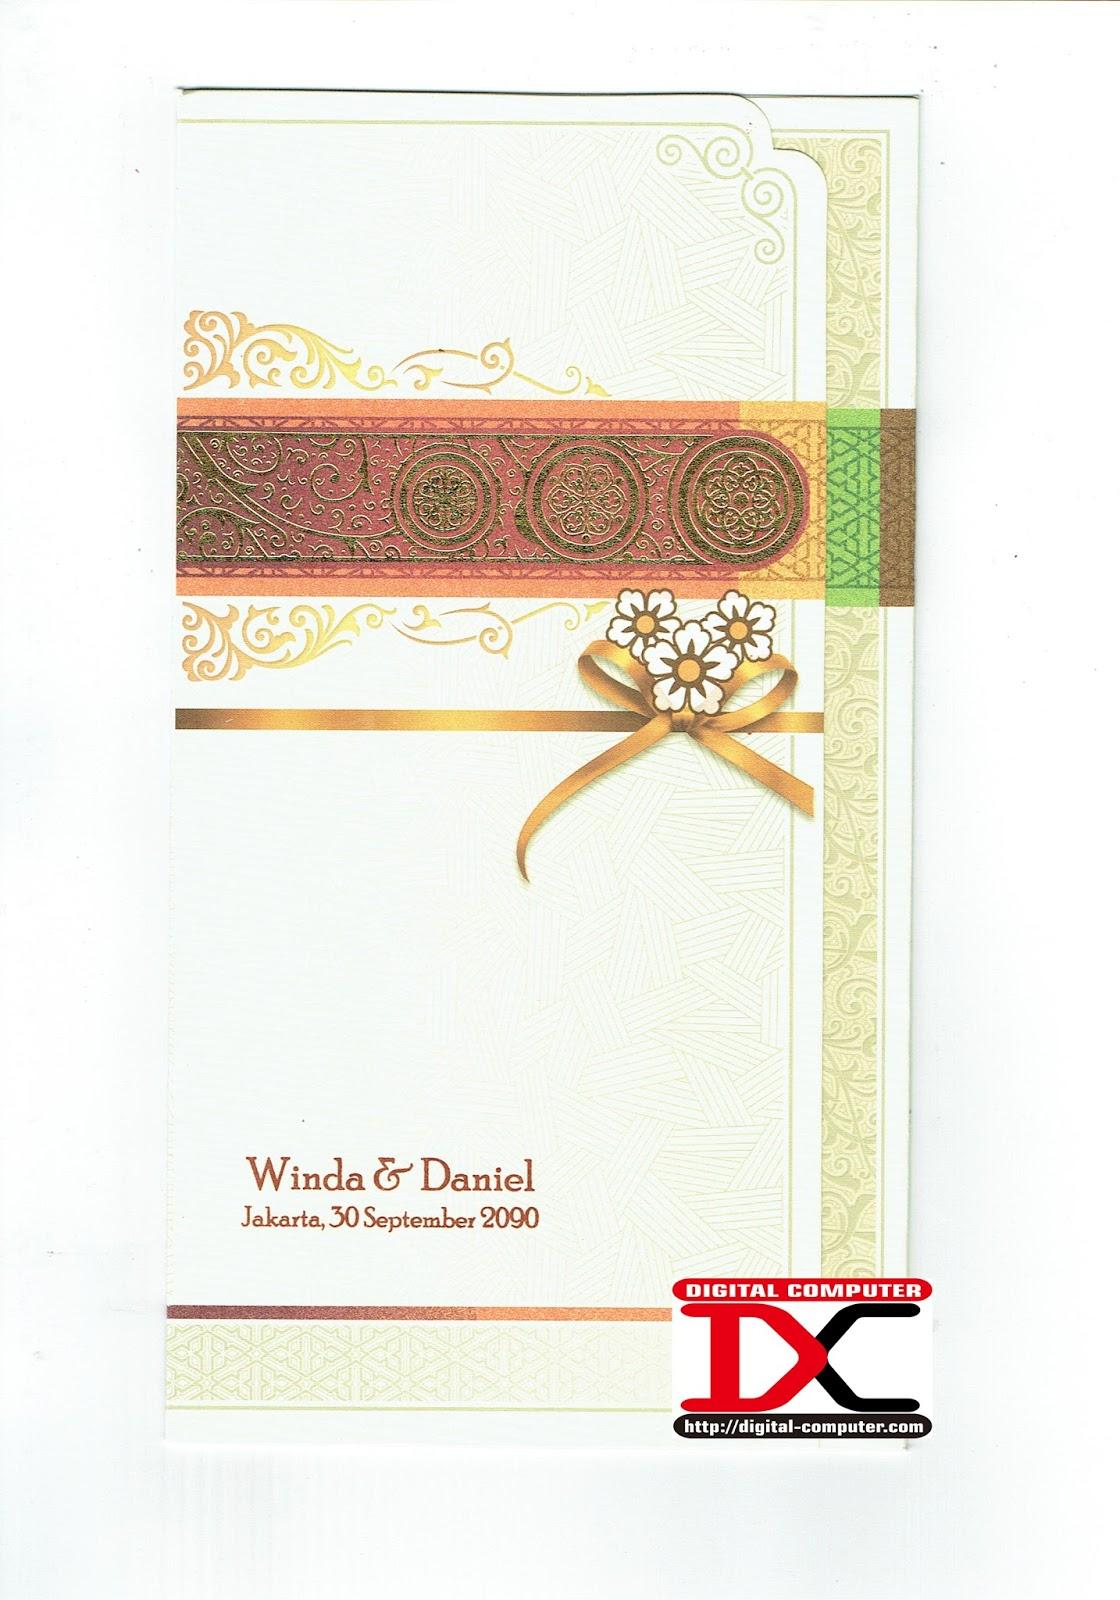 undangan pernikahan harga 2500